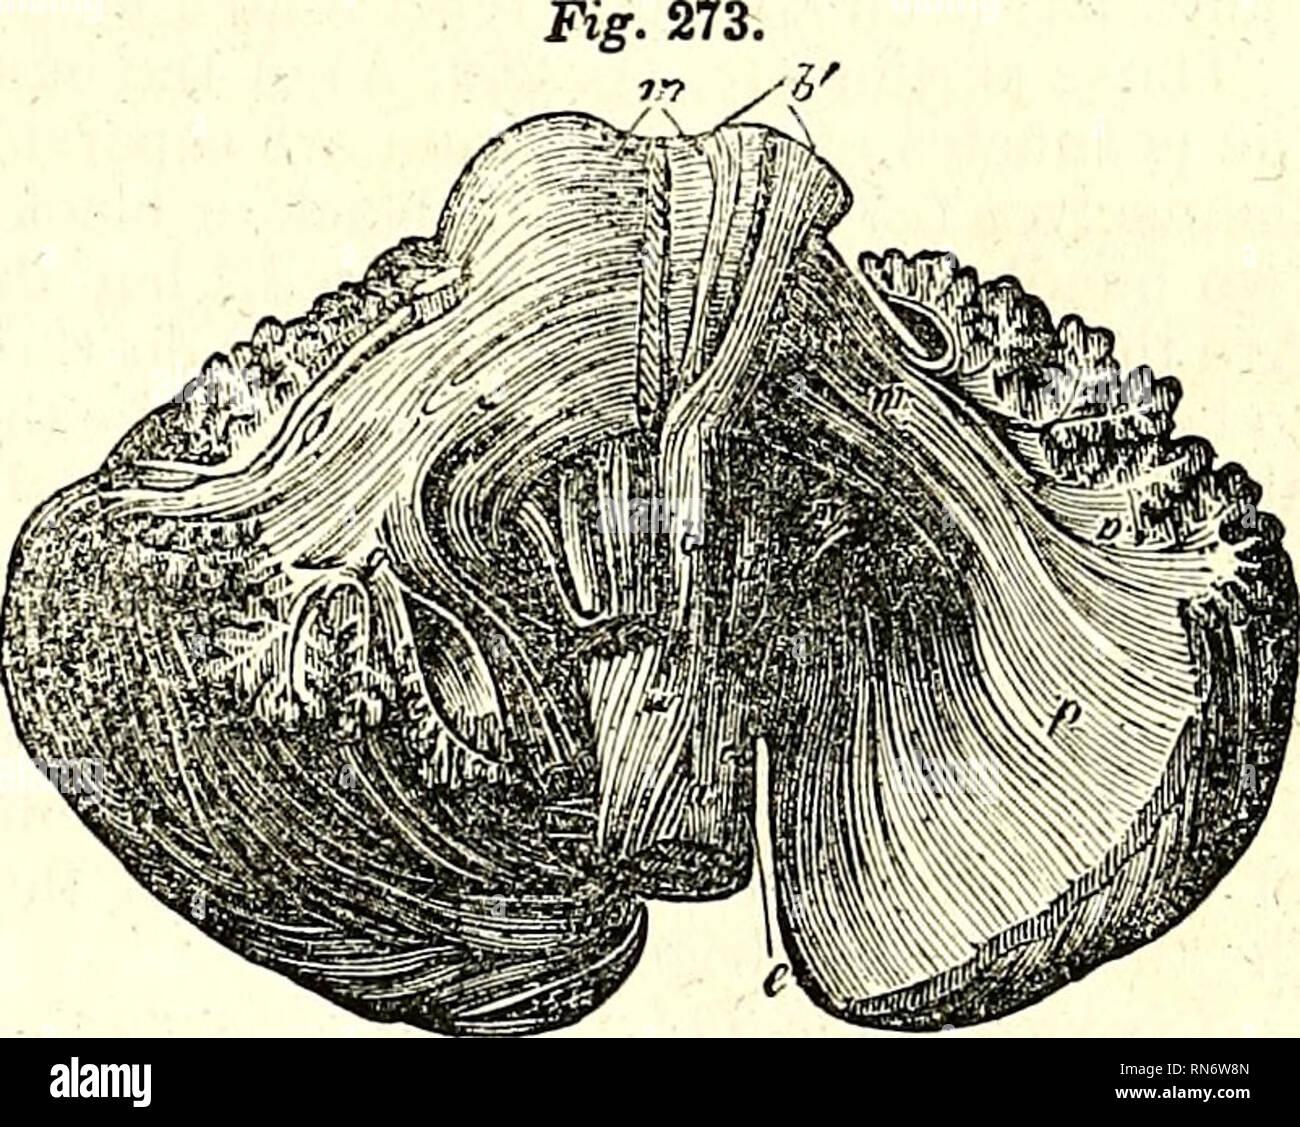 The Anatomy Of The Human Body Human Anatomy Anatomy Internal